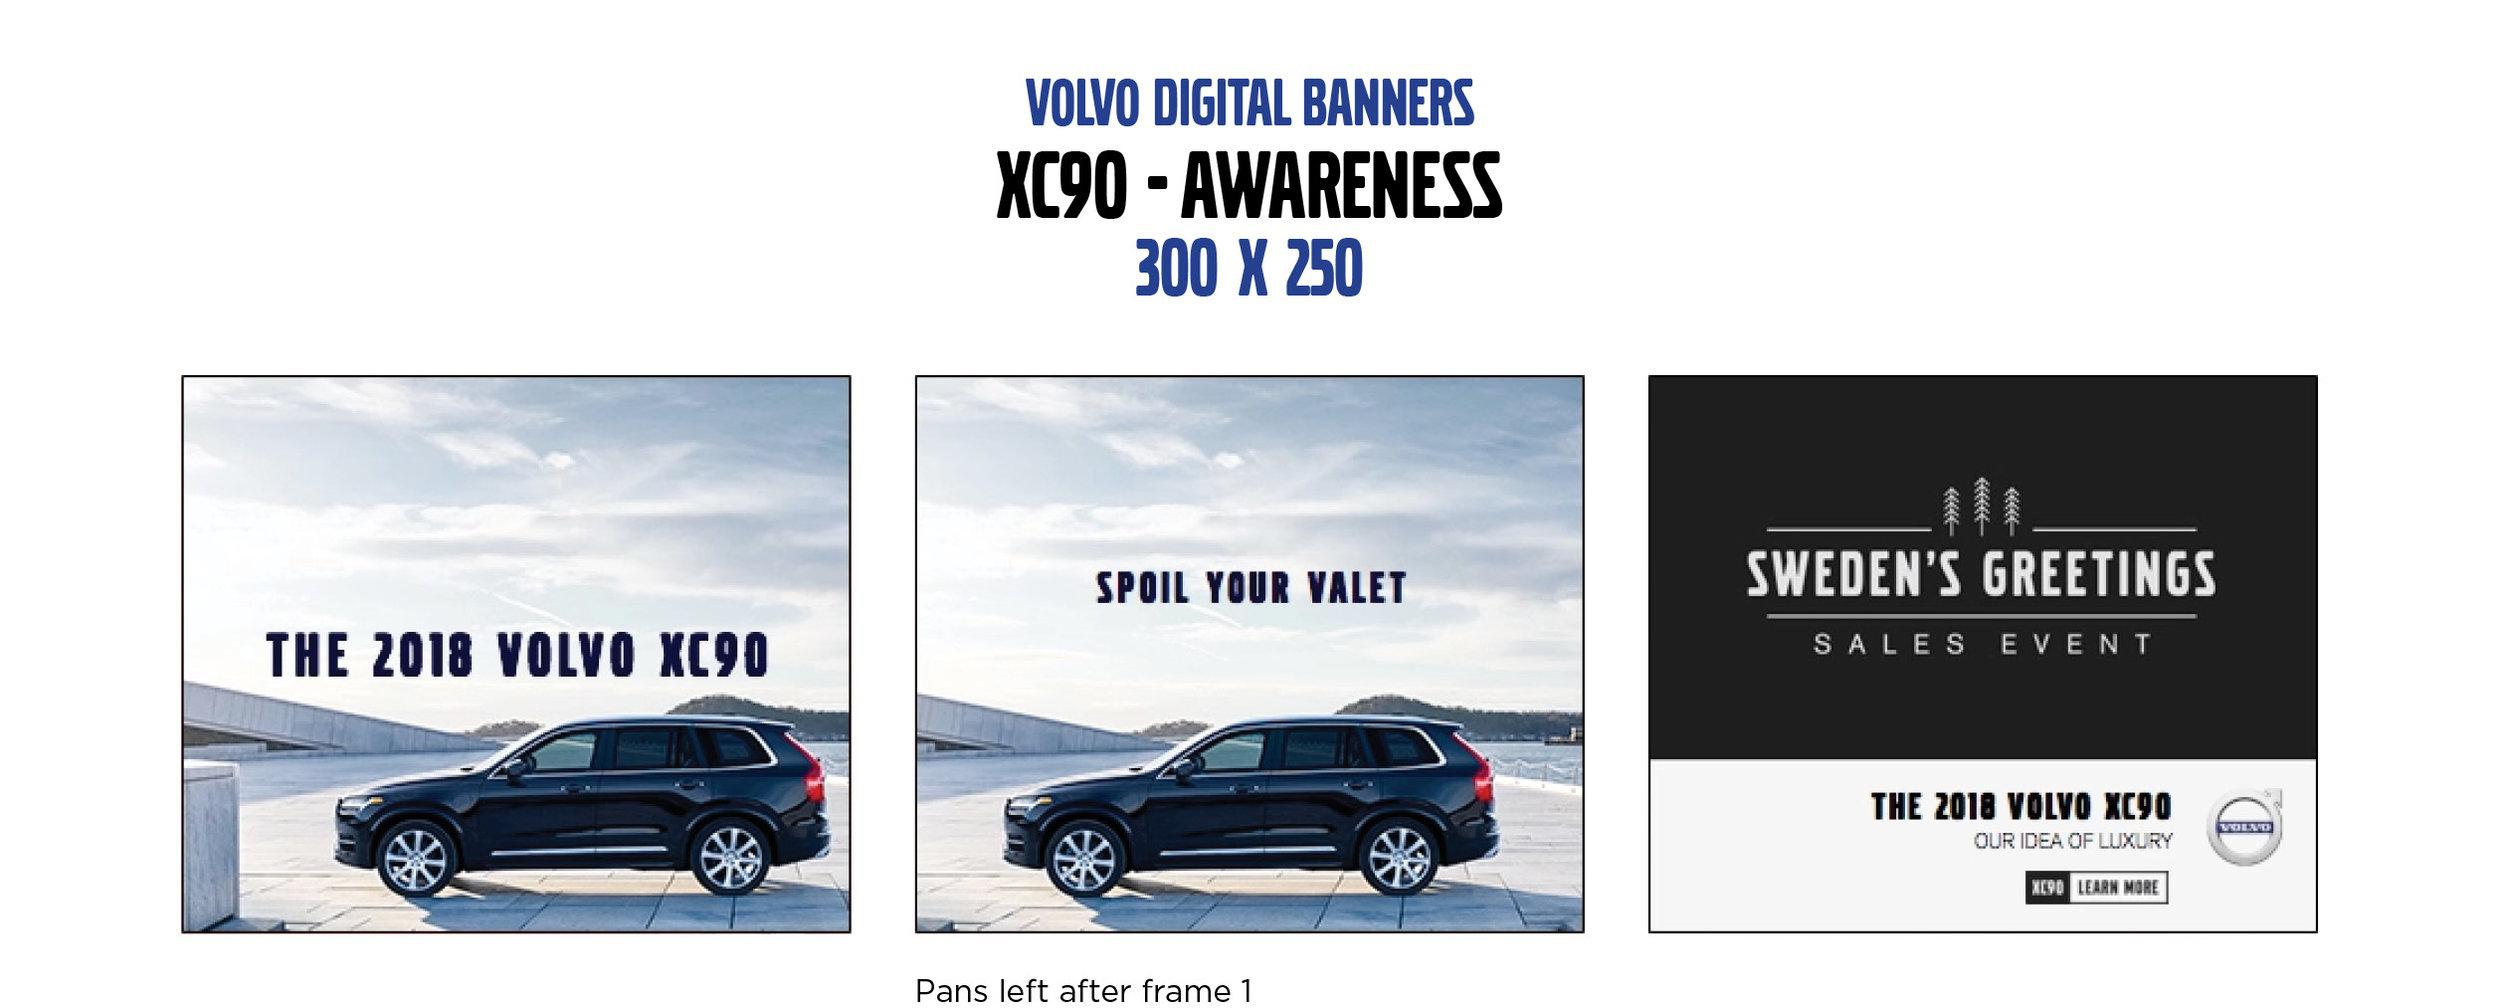 XC90_Awareness.jpg